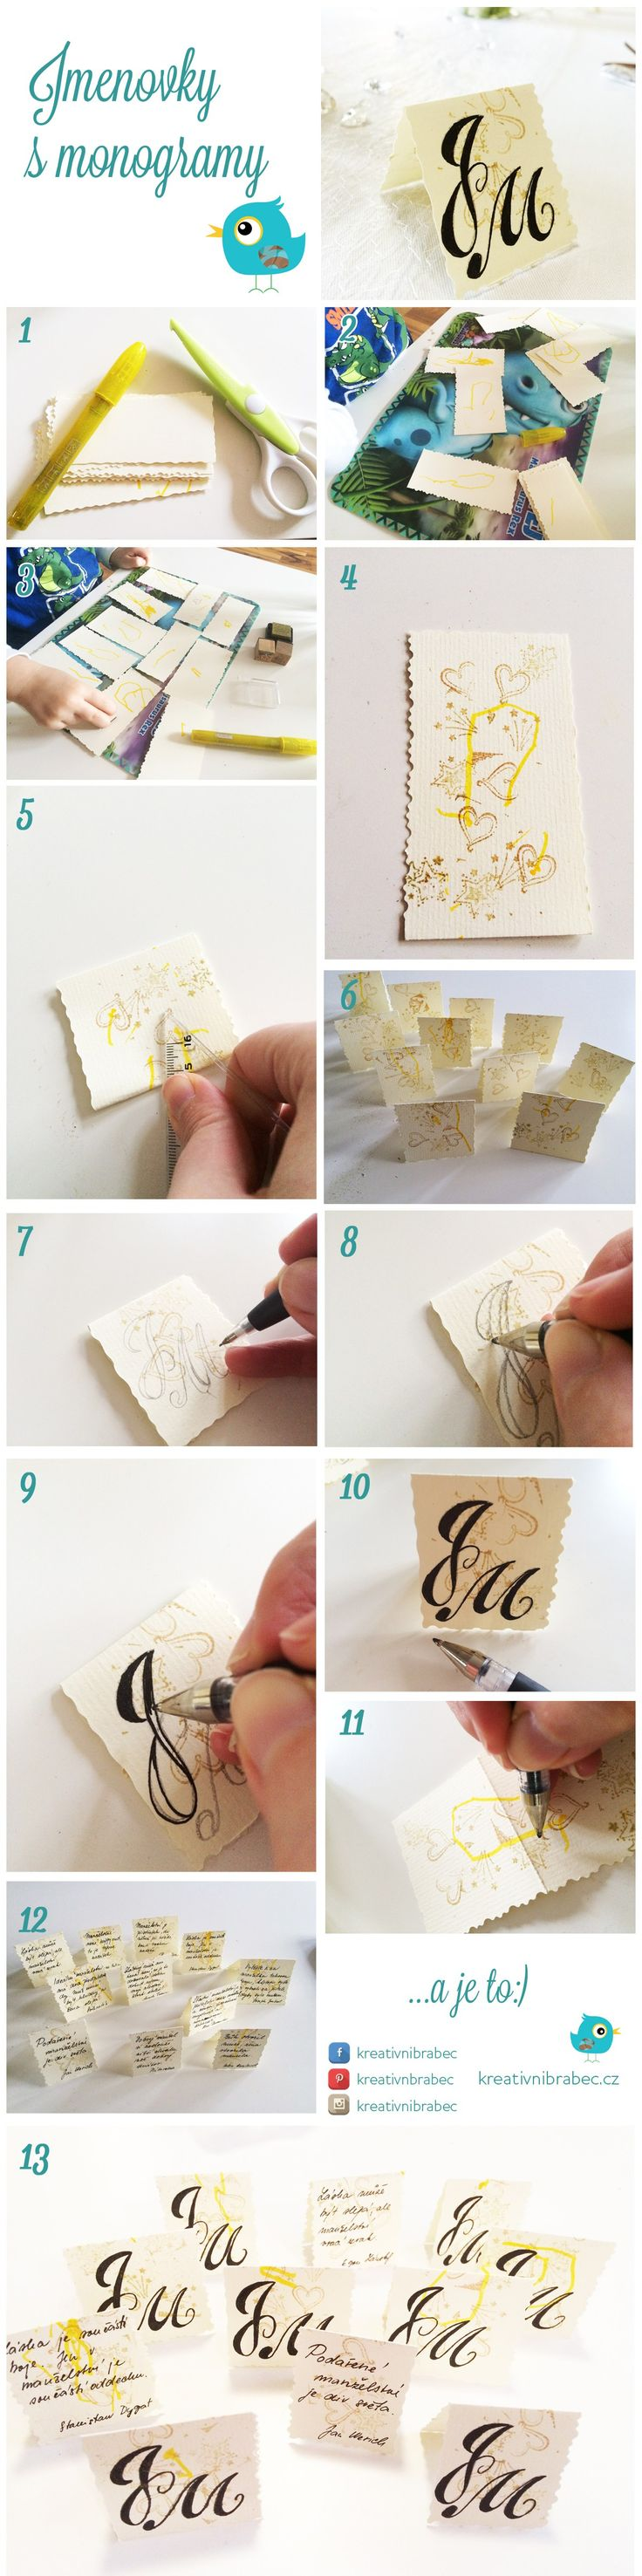 Jednoduchý návod ke kartičkám s monogramem a citáty